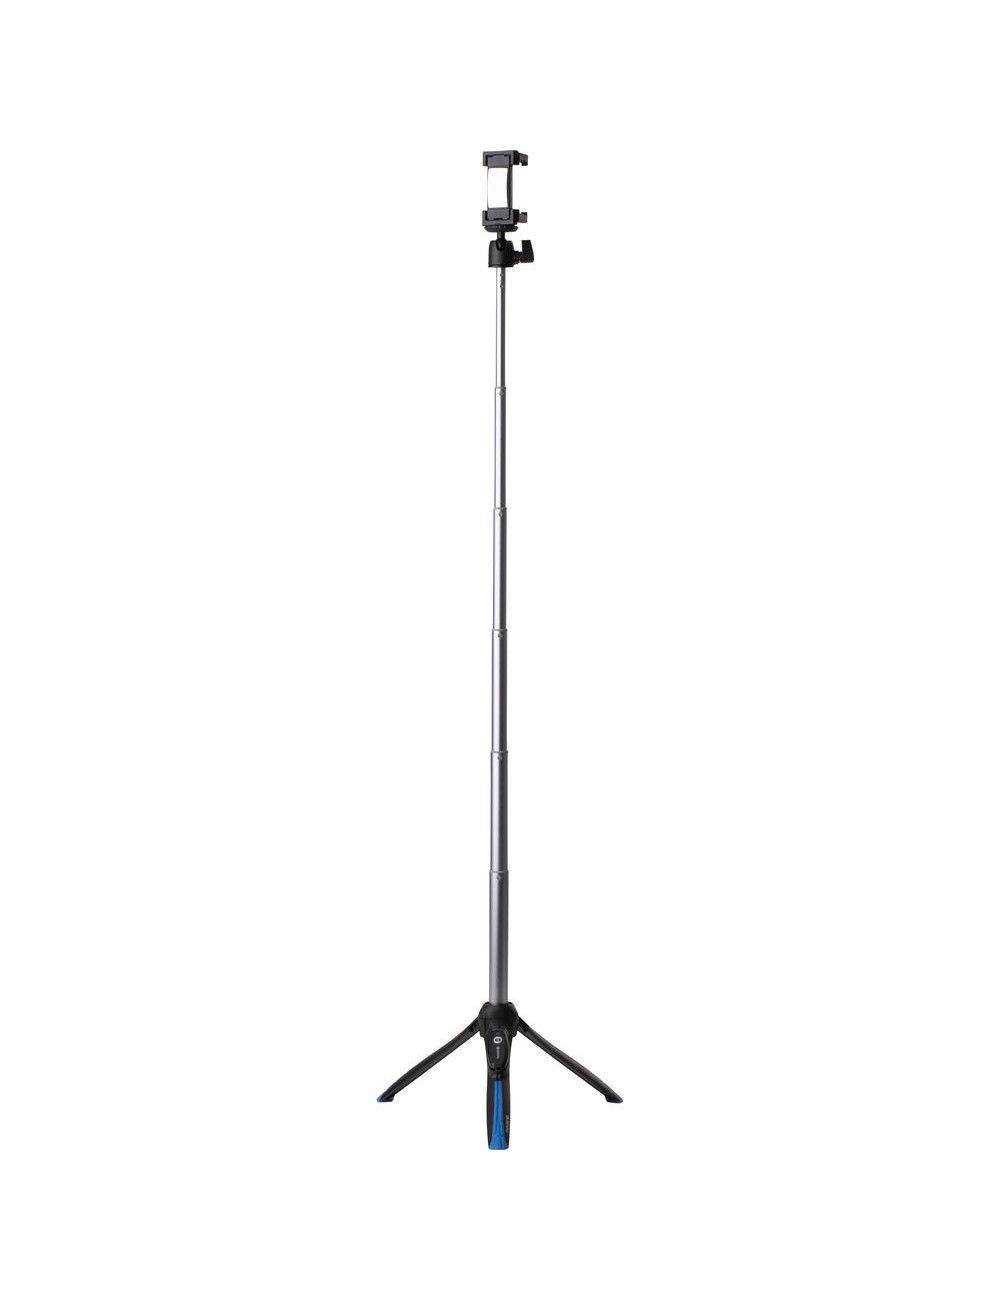 KIT Micrófono Terreno Caña de fibra de carbono + Zeppelin + Micrófono Boya PVM1000 kitz